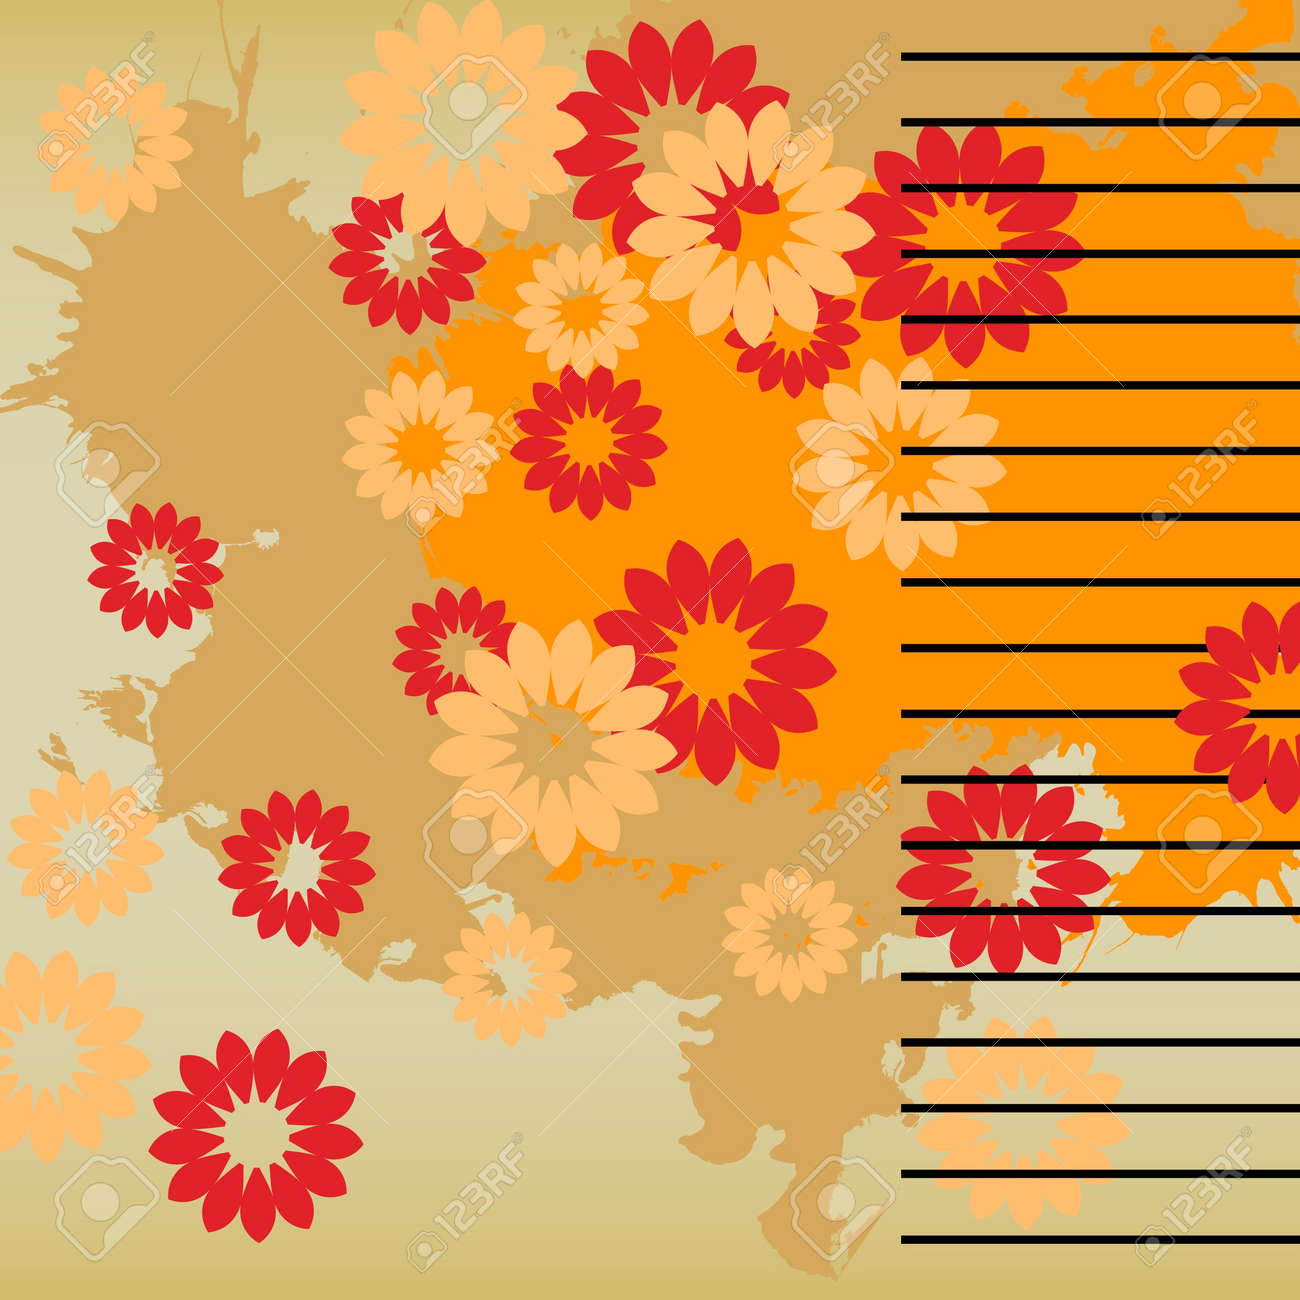 art vintage pattern background Stock Photo - 13015931